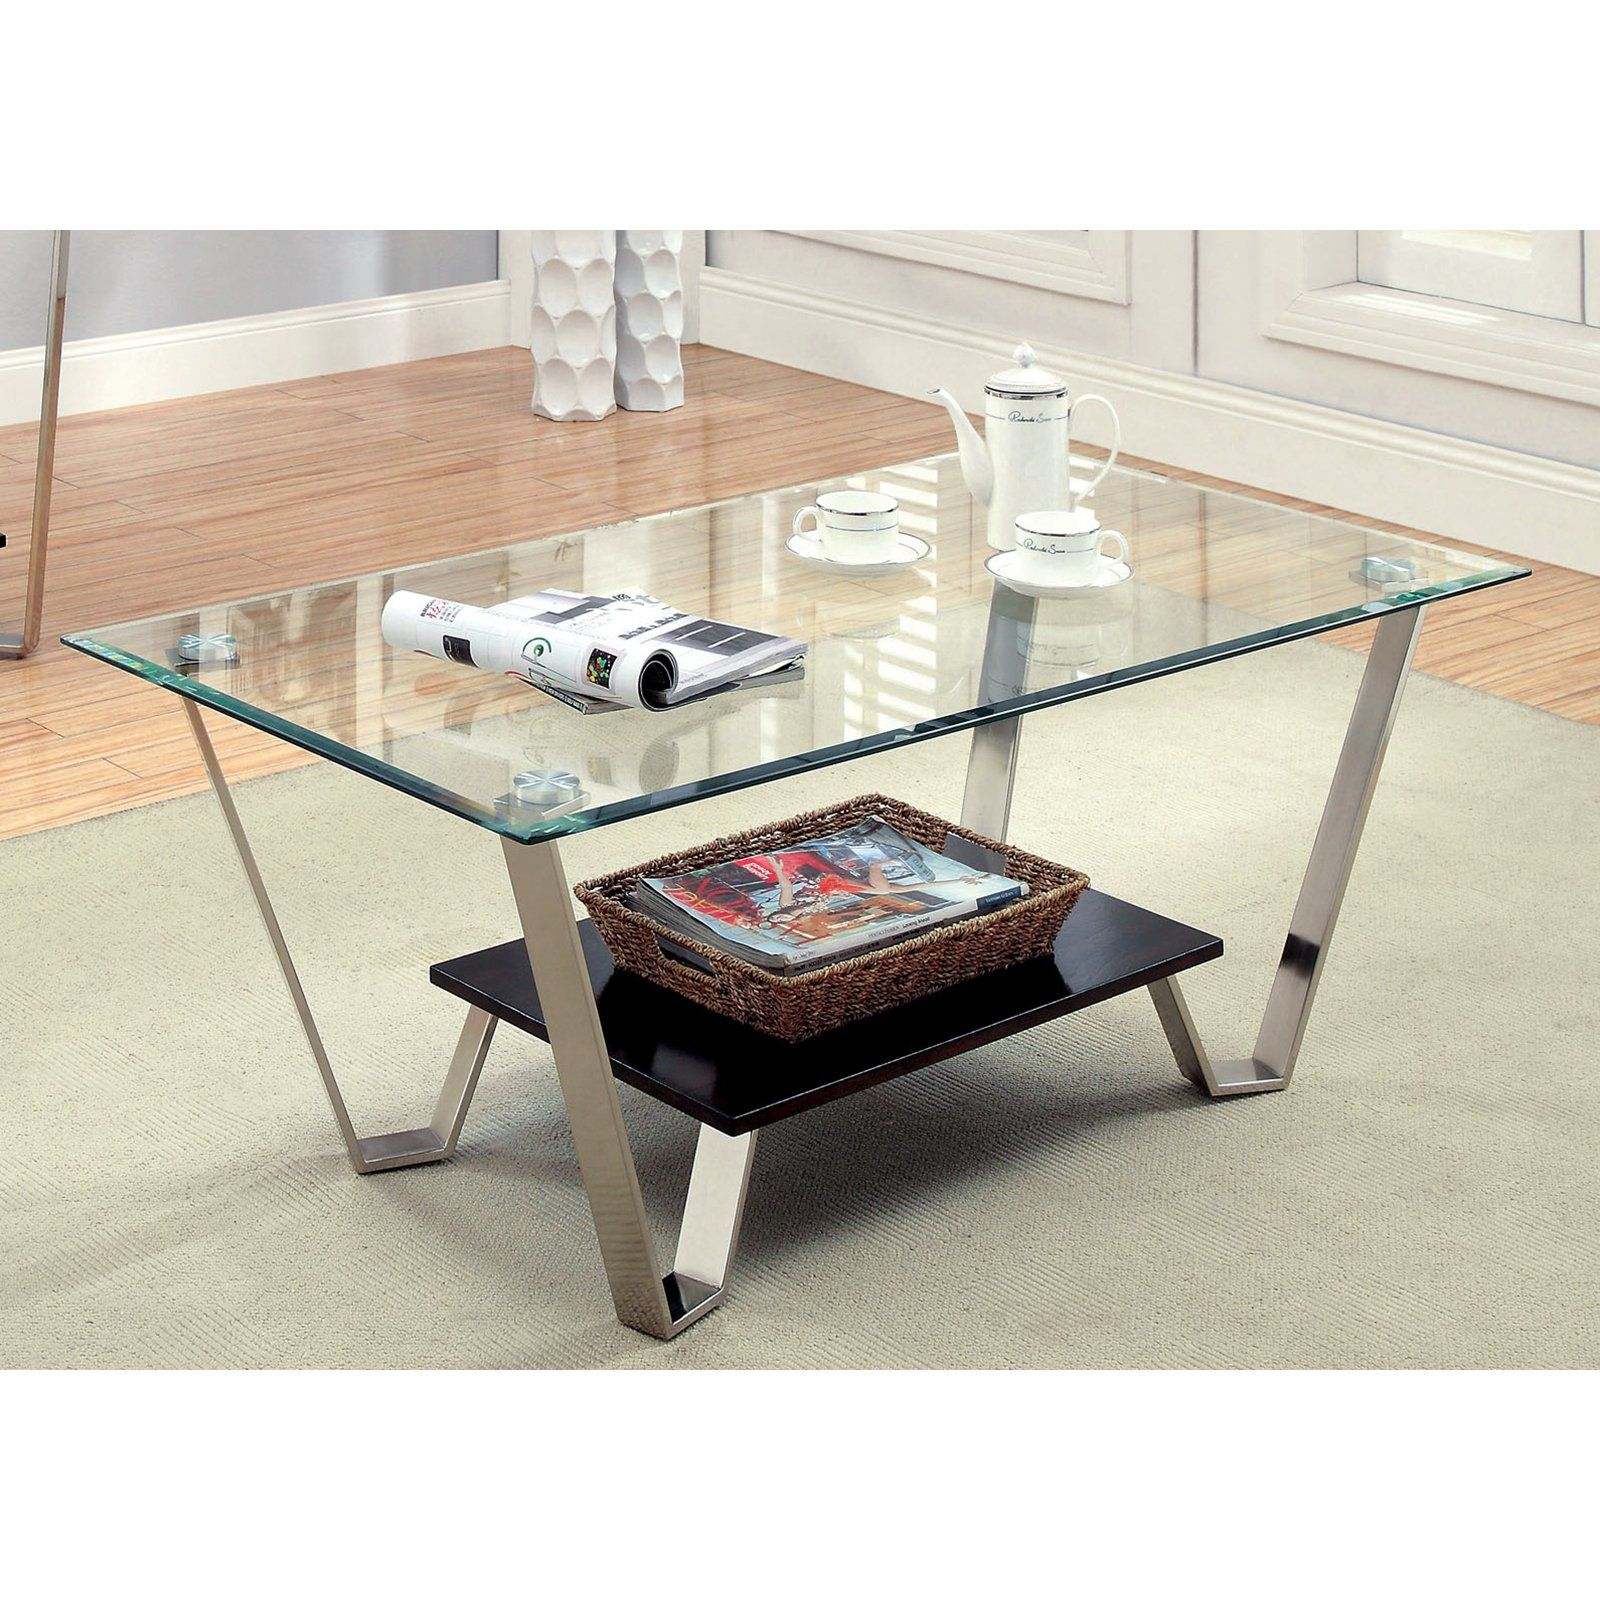 Furniture Of America Ardea Beveled Glass Top Coffee Table Chrome Espresso Www Hayneed Coffee Table Coffee Table And Side Table Set Glass Top Coffee Table [ 1600 x 1600 Pixel ]